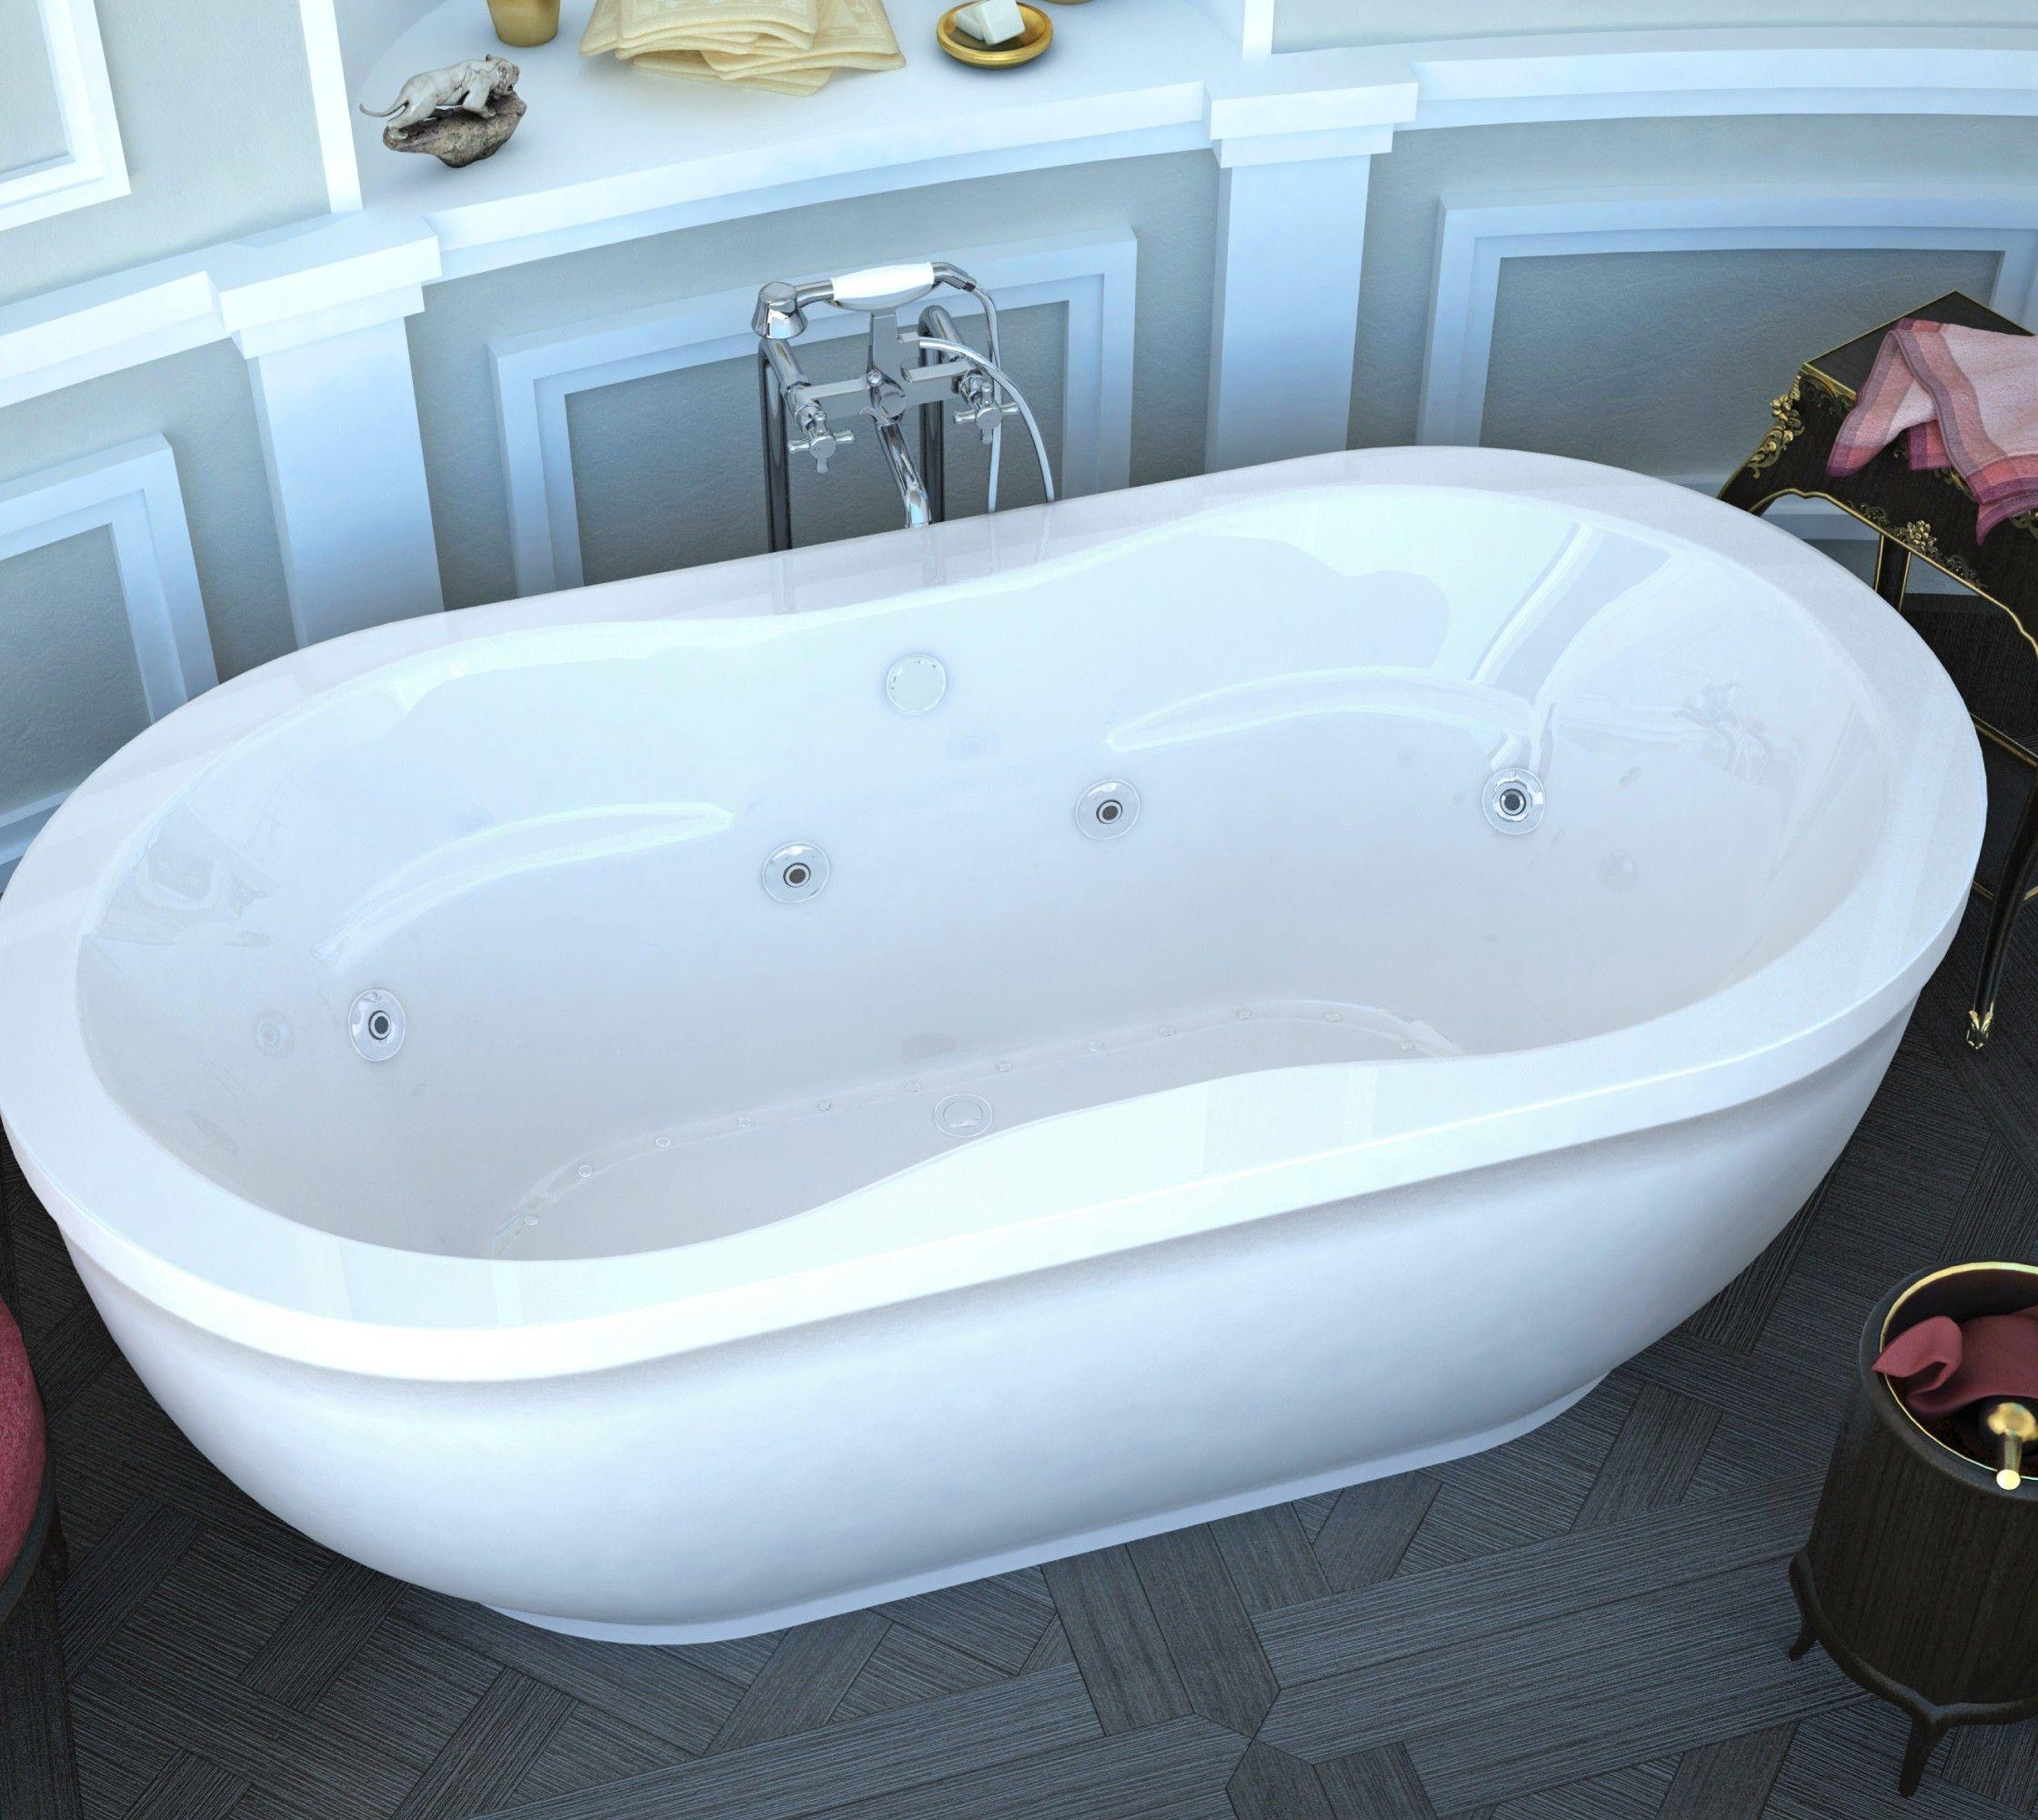 Freestanding air whirlpool jetted bathtub white